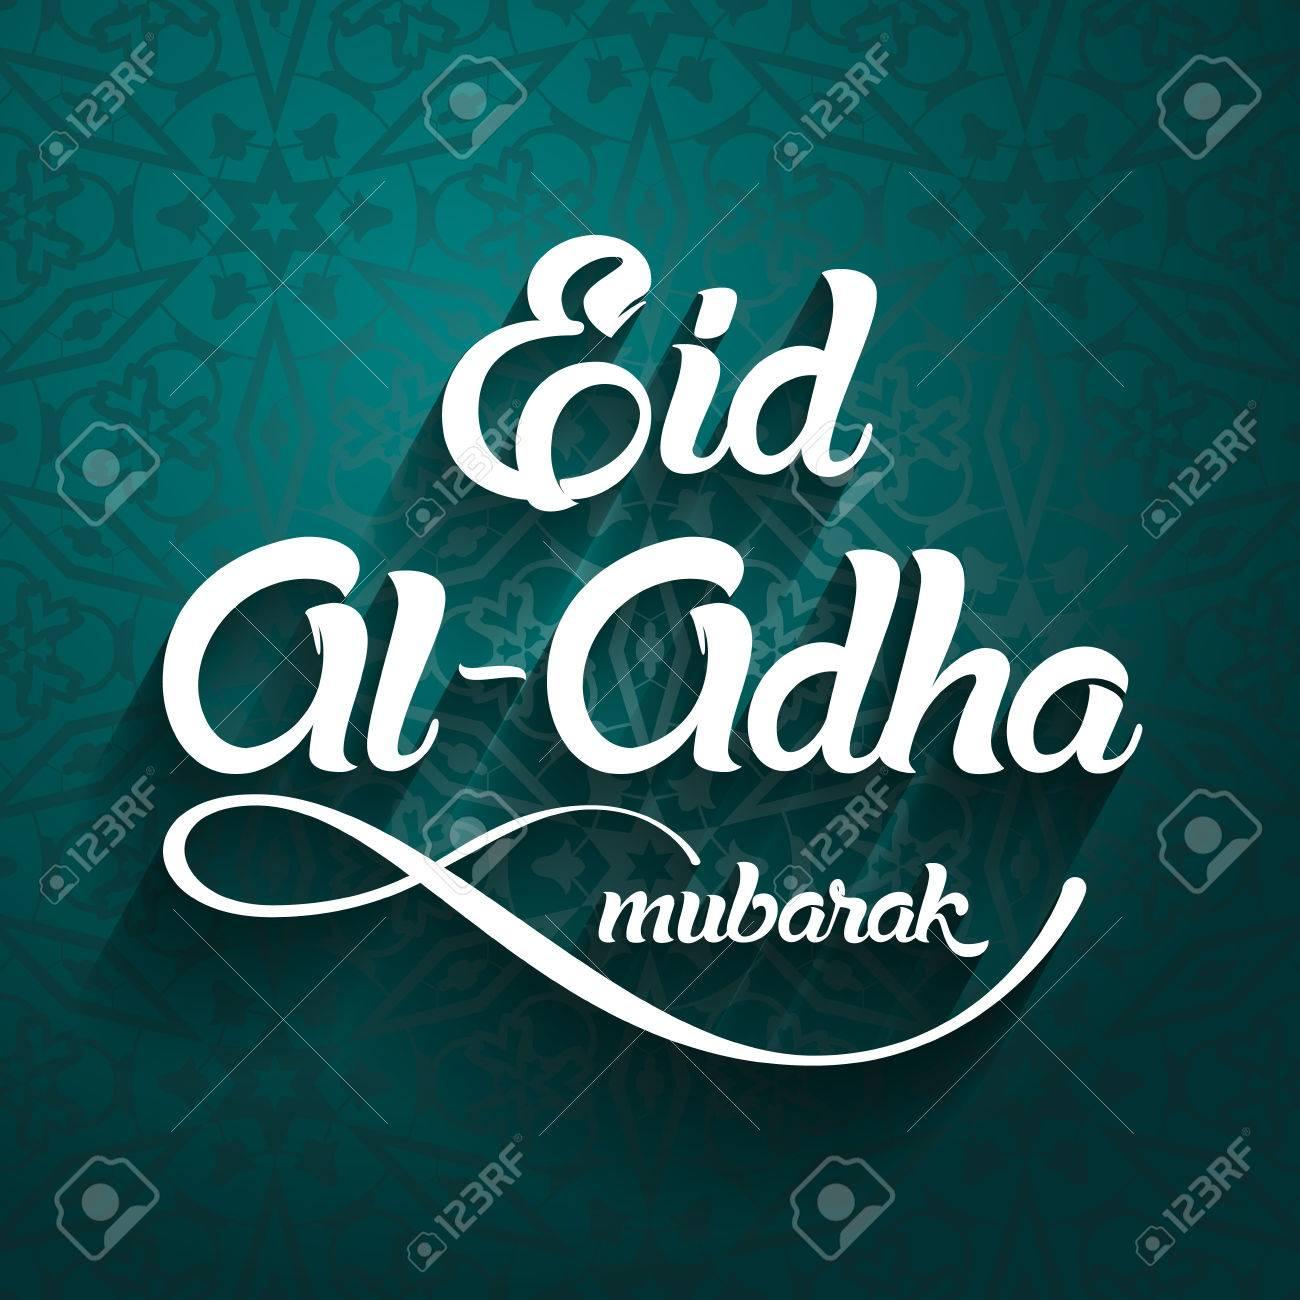 Eid al adha eid ul adha mubarak kurban bayrami kurban bajram greeting vector illustration eid al adha eid ul adha mubarak kurban bayrami kurban bajram m4hsunfo